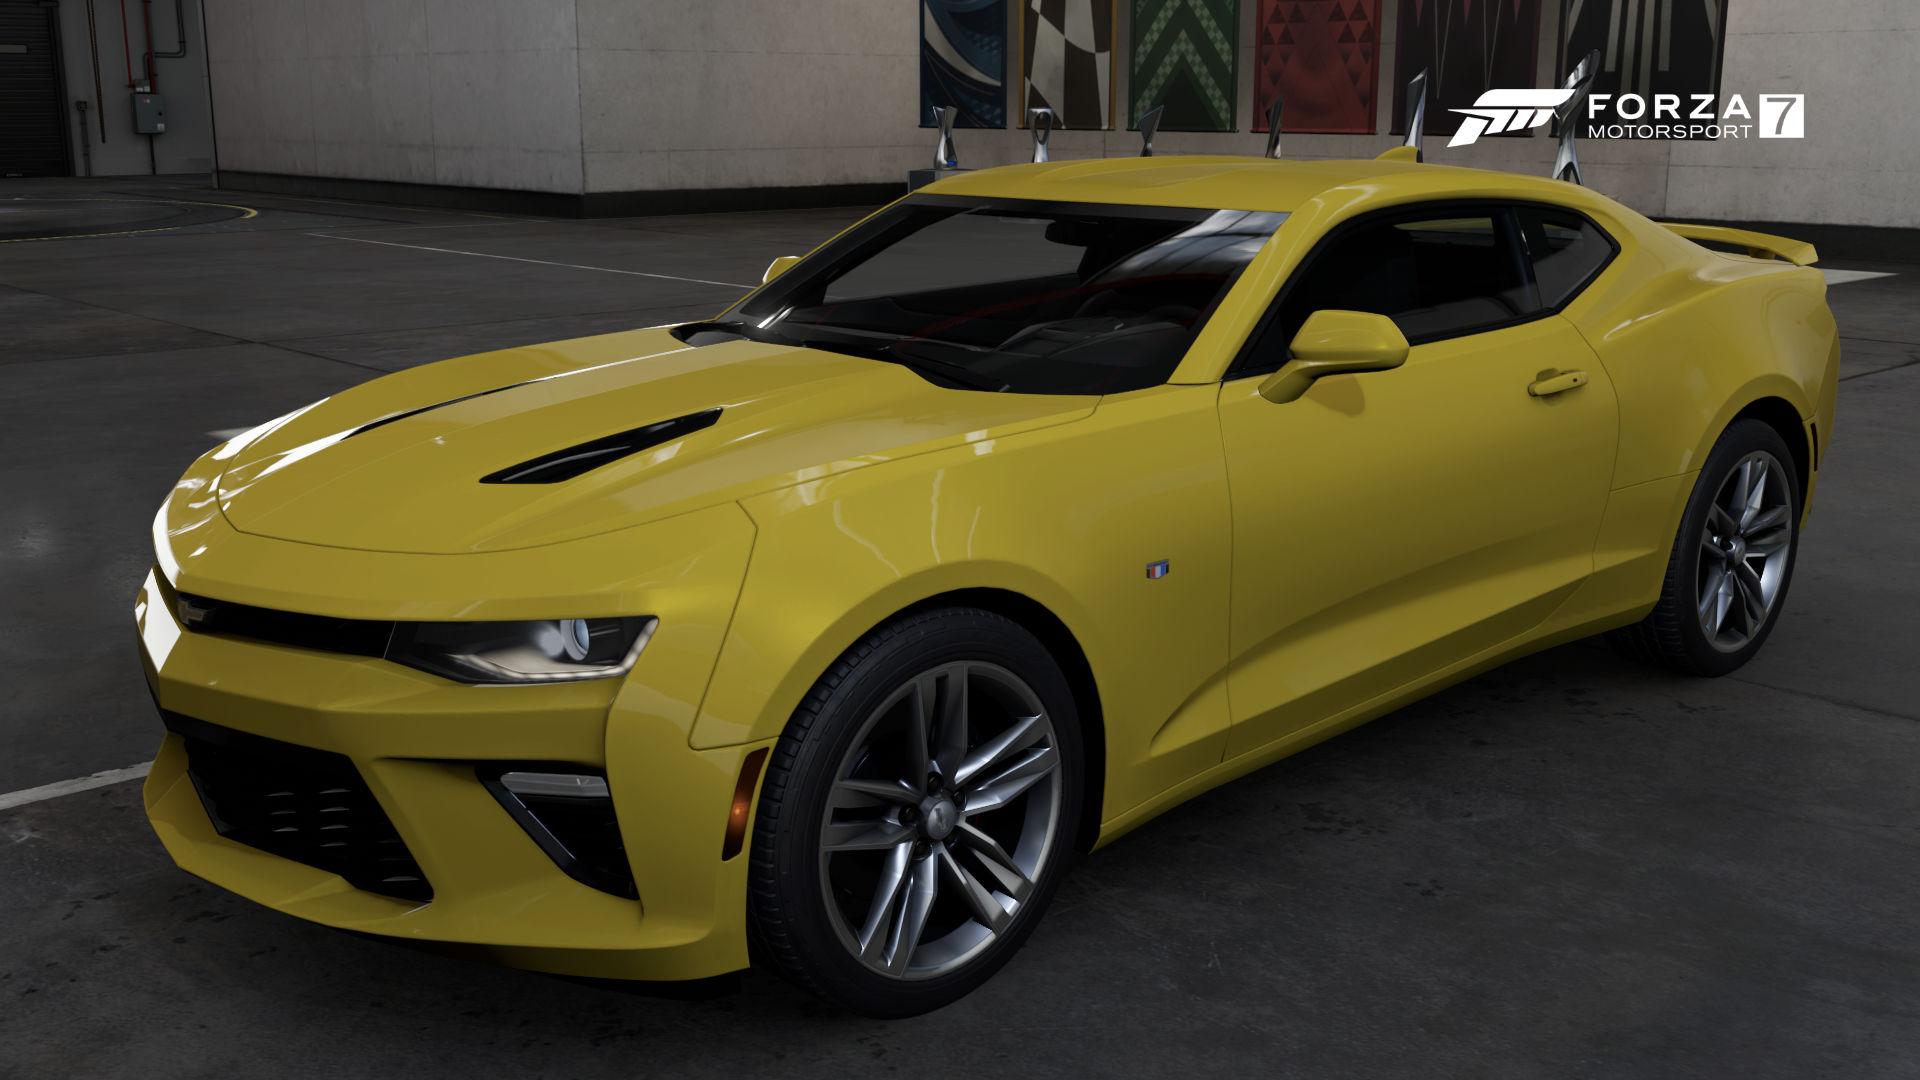 Chevrolet Camaro Super Sport 2016 Forza Motorsport